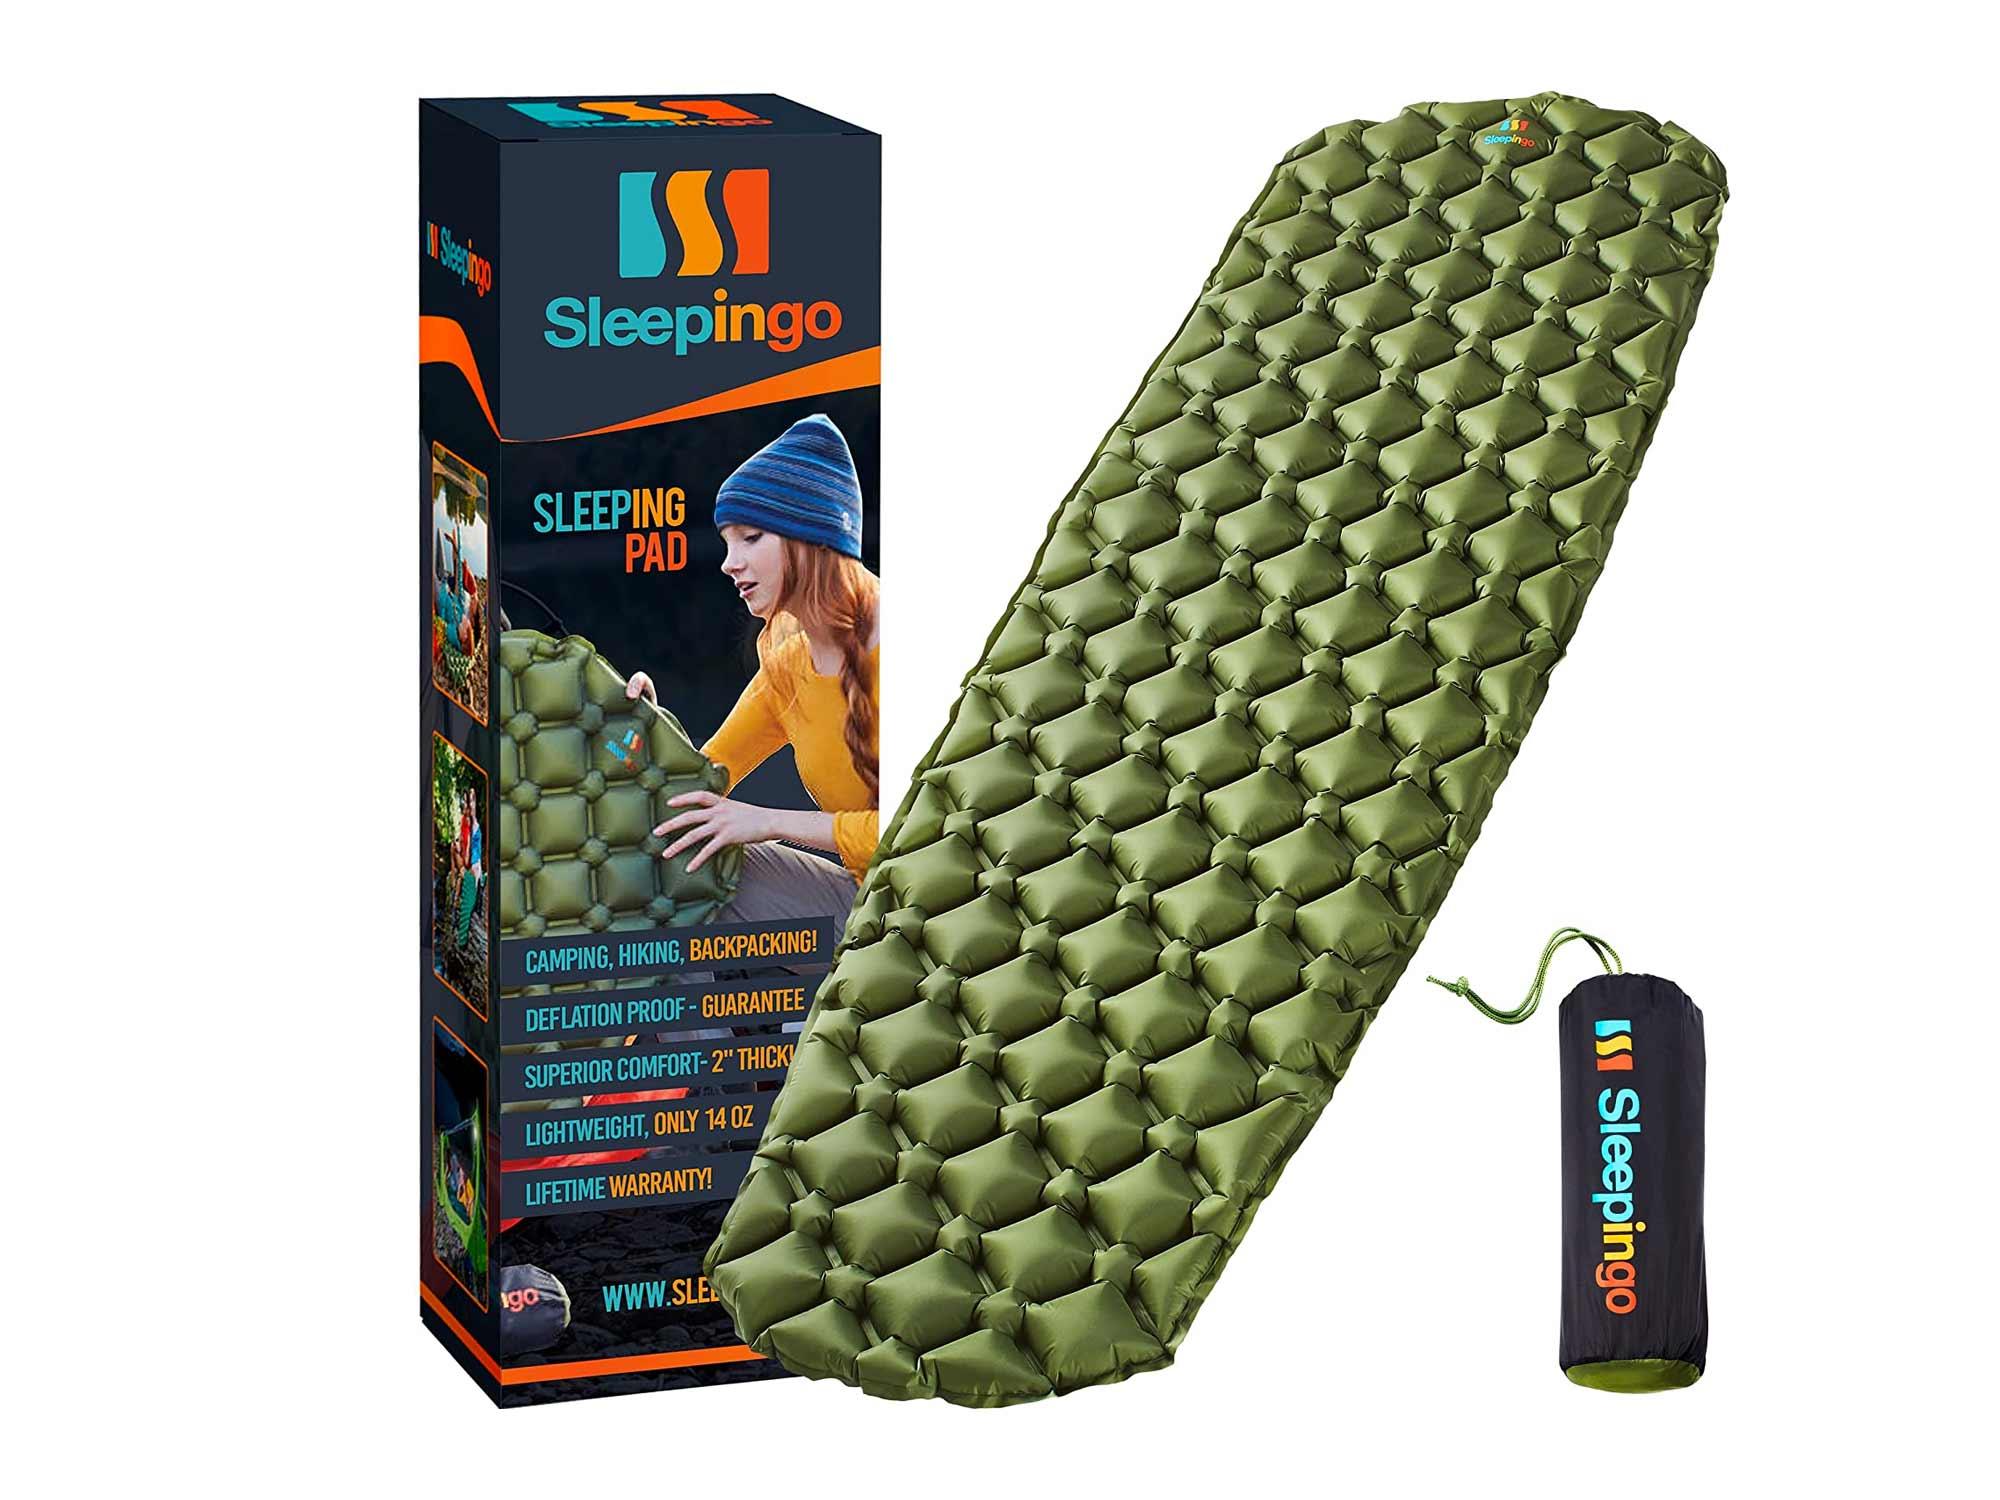 Sleepingo Camping Sleeping Pad - Mat, (Large), Ultralight 14.5 OZ, Best Sleeping Pads for Backpacking,